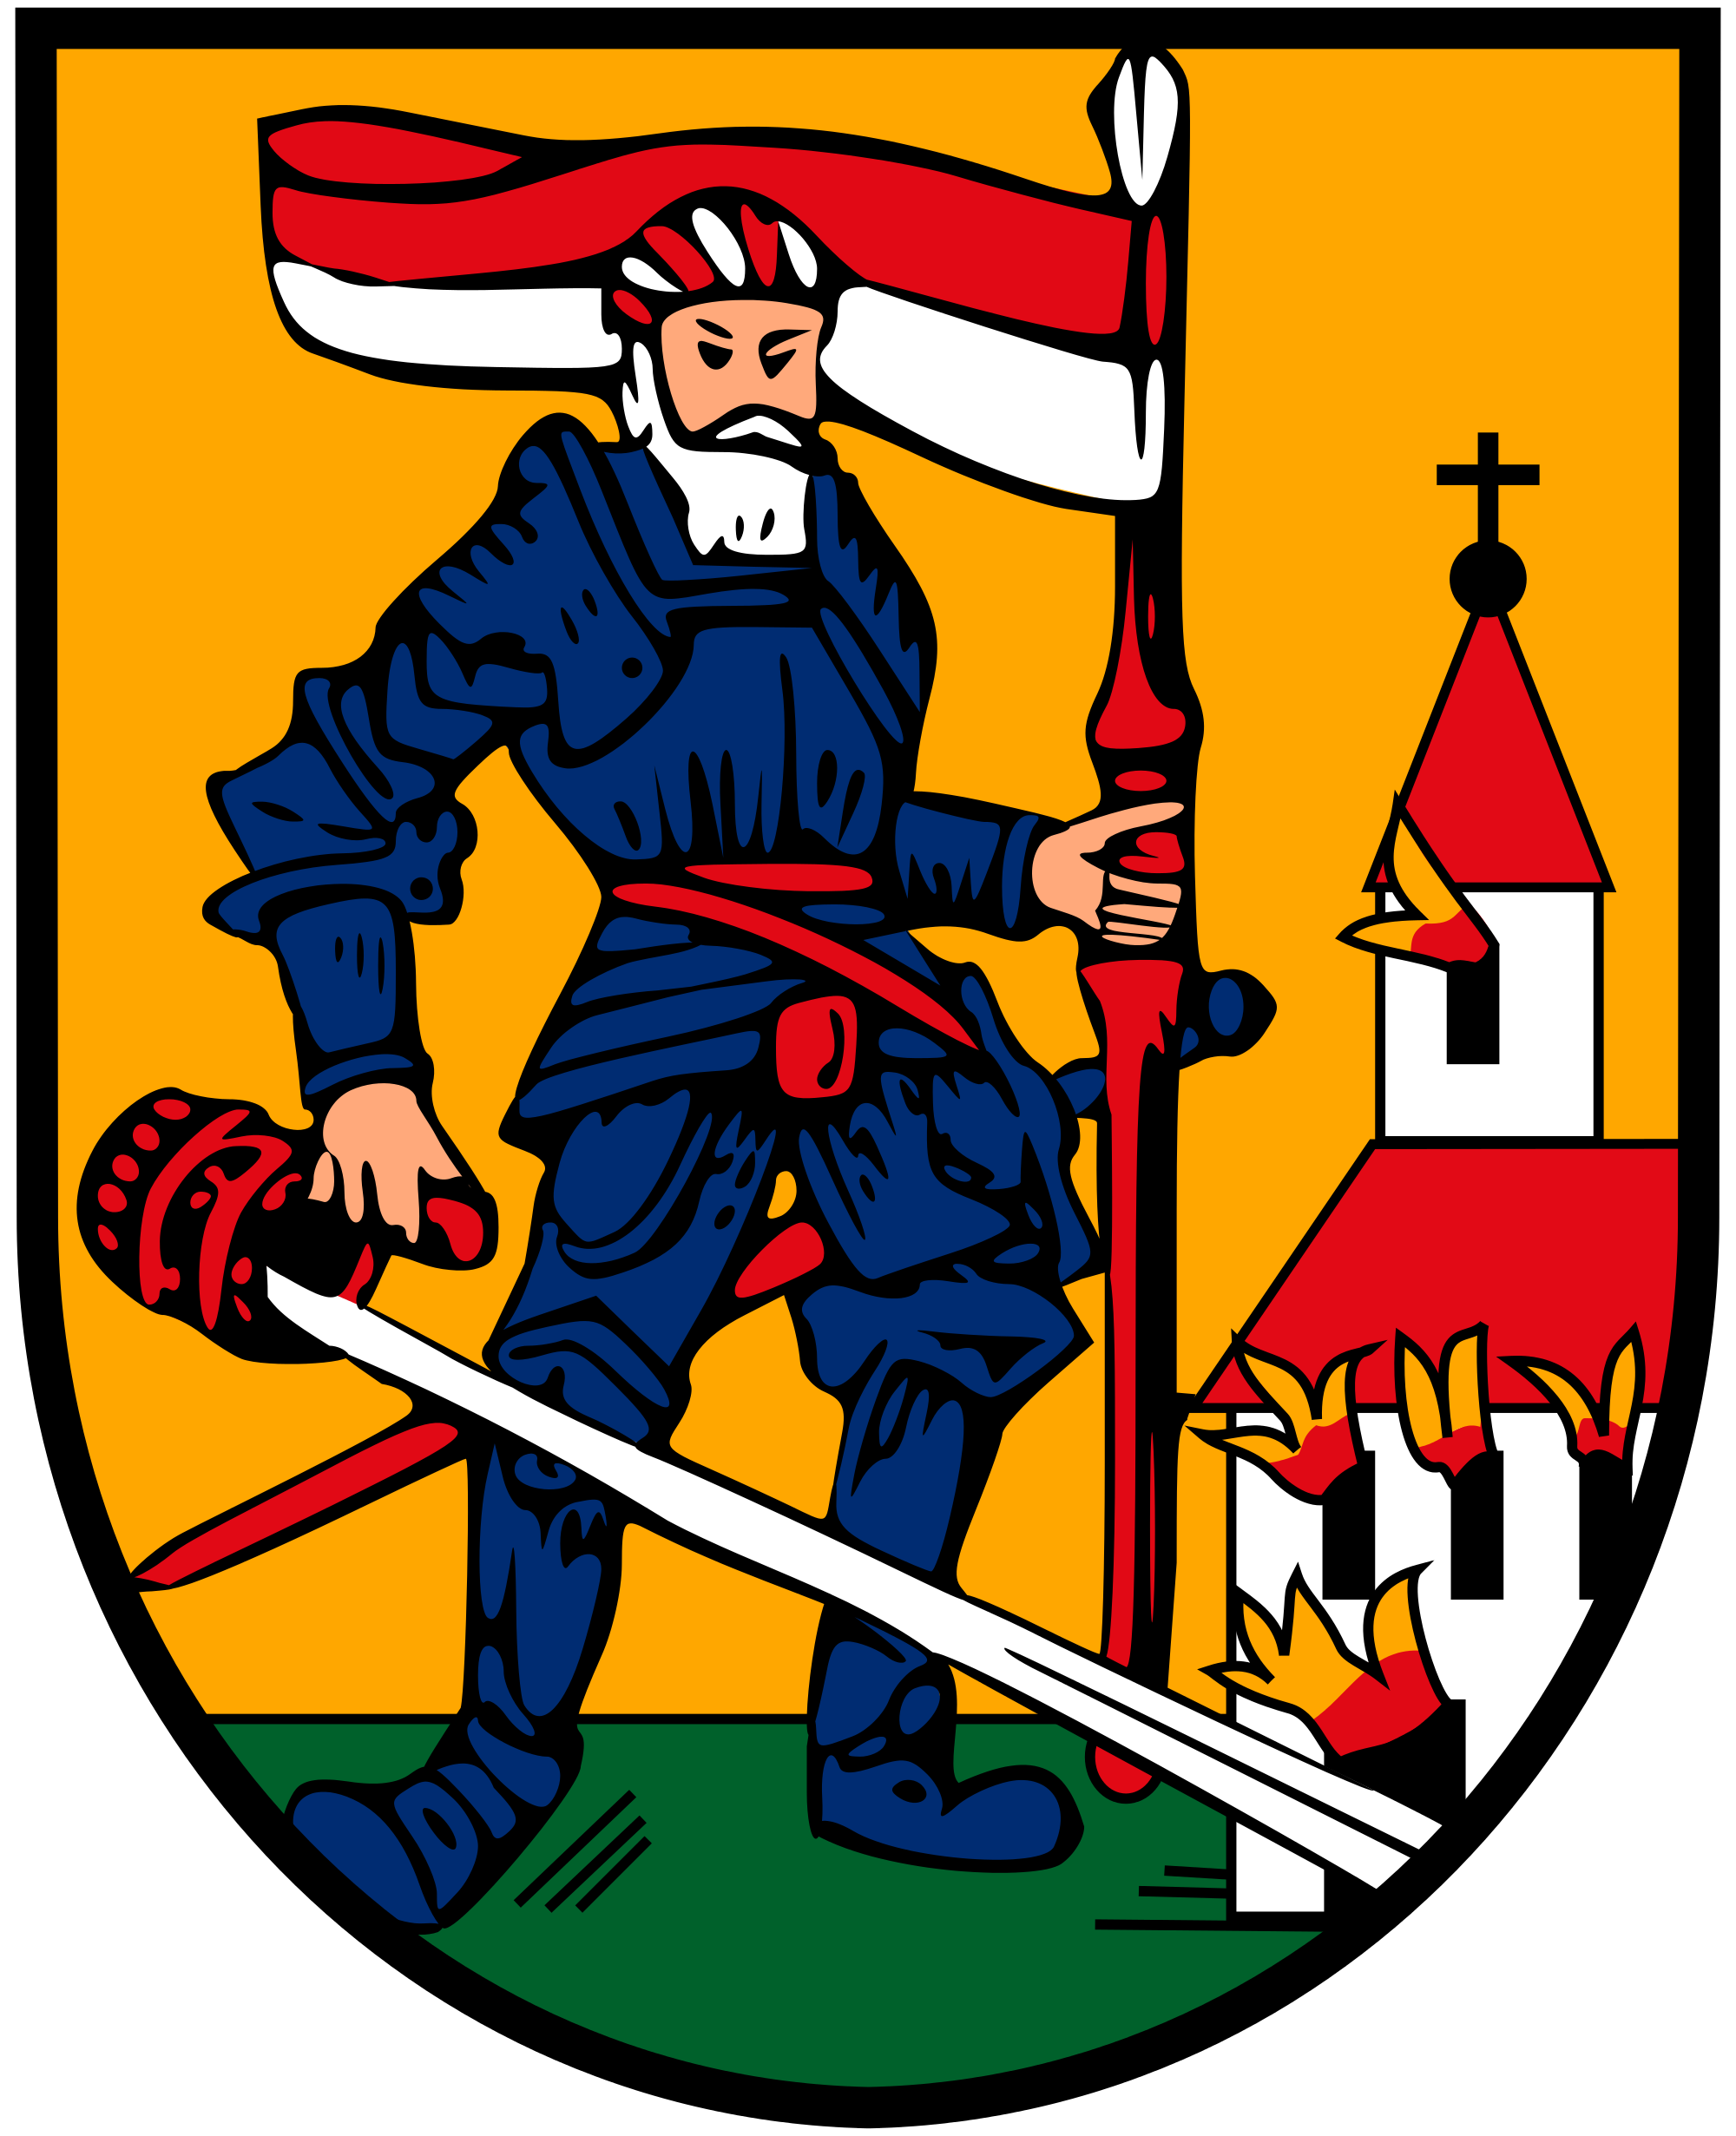 File:Coat of arms Neumarkt im Hausruckkreis.svg.